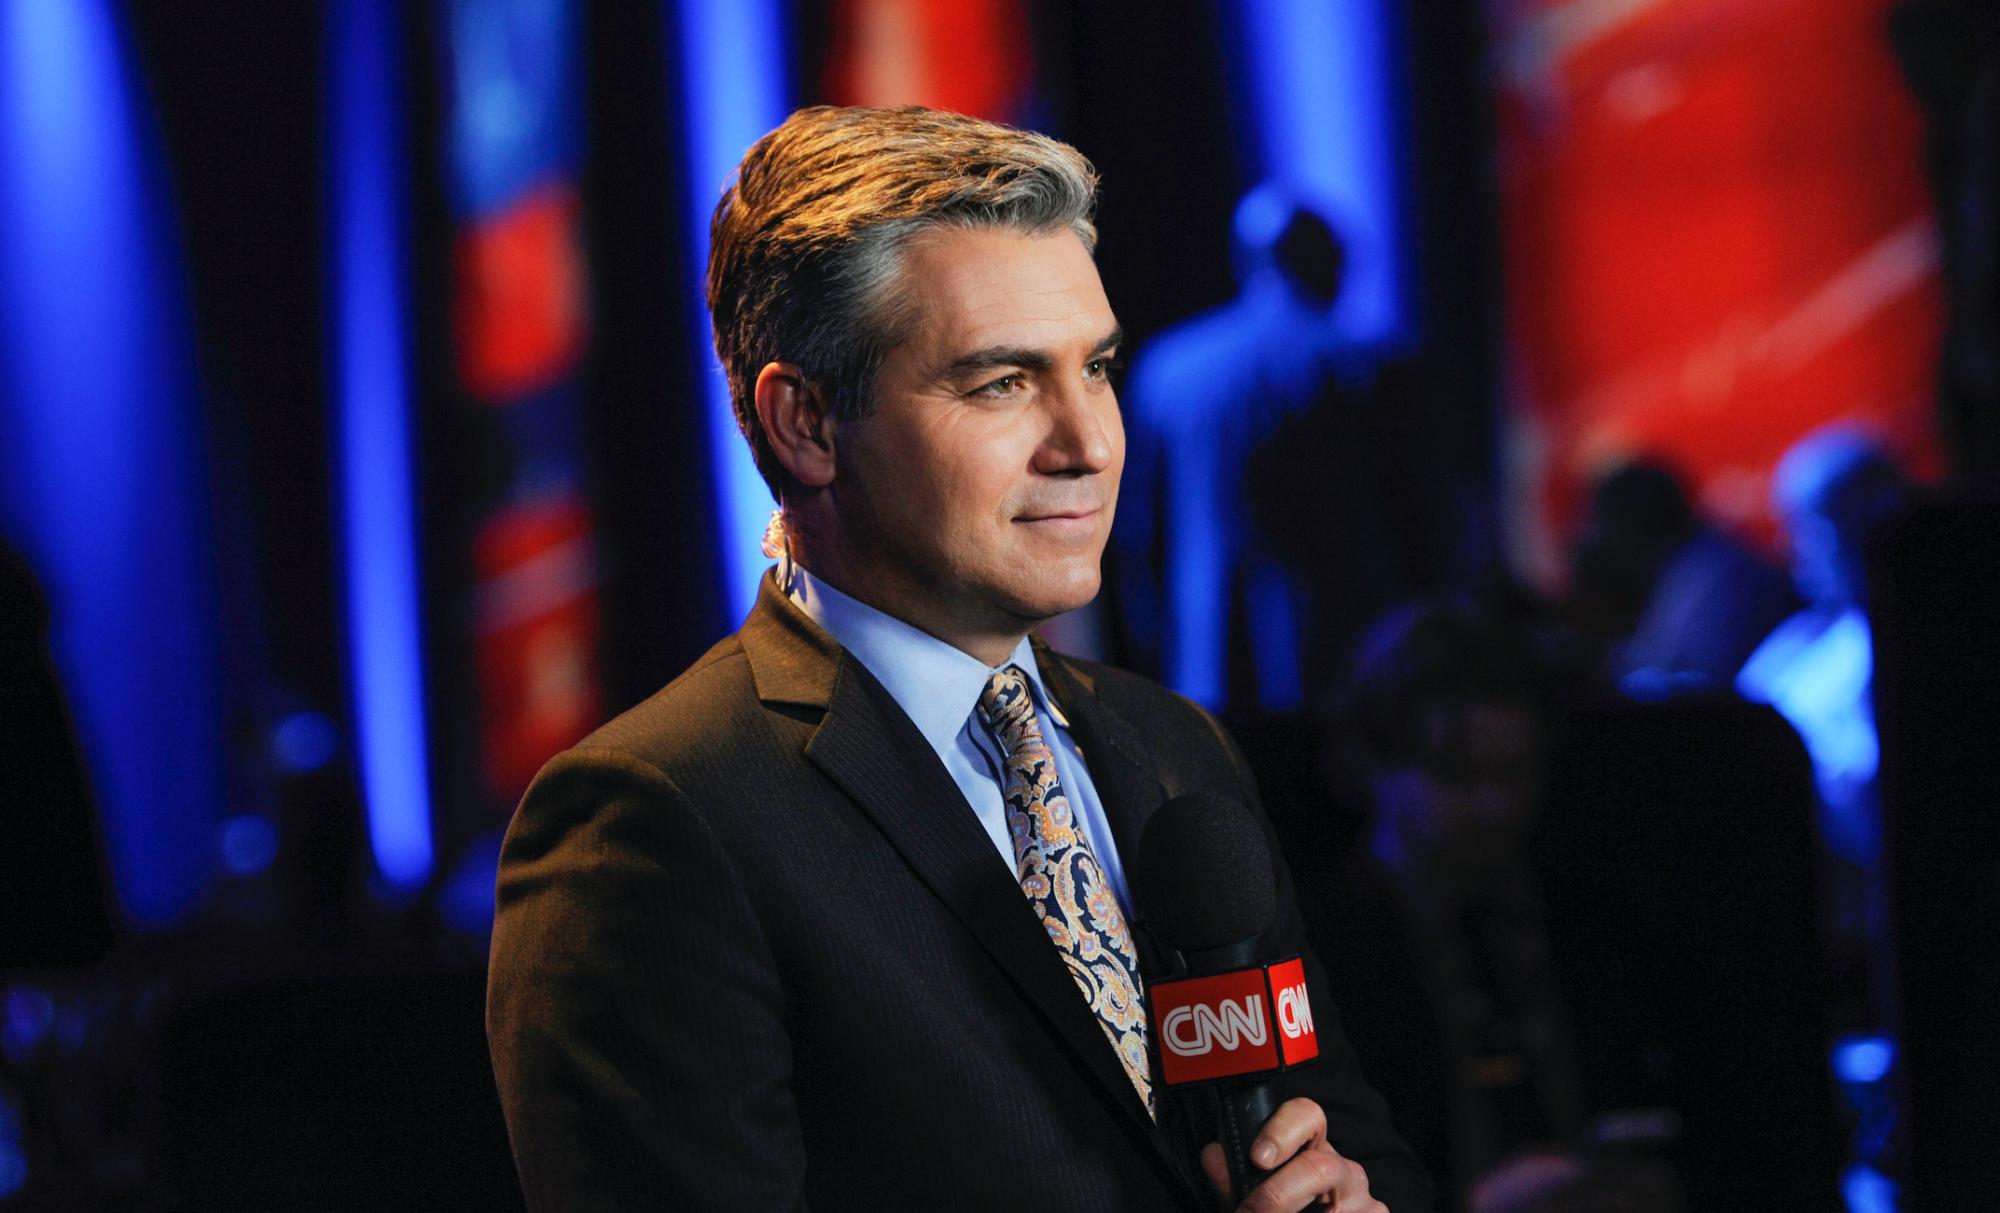 CNN's Jim Acosta Leaves White House Scrum for Weekend News Battle